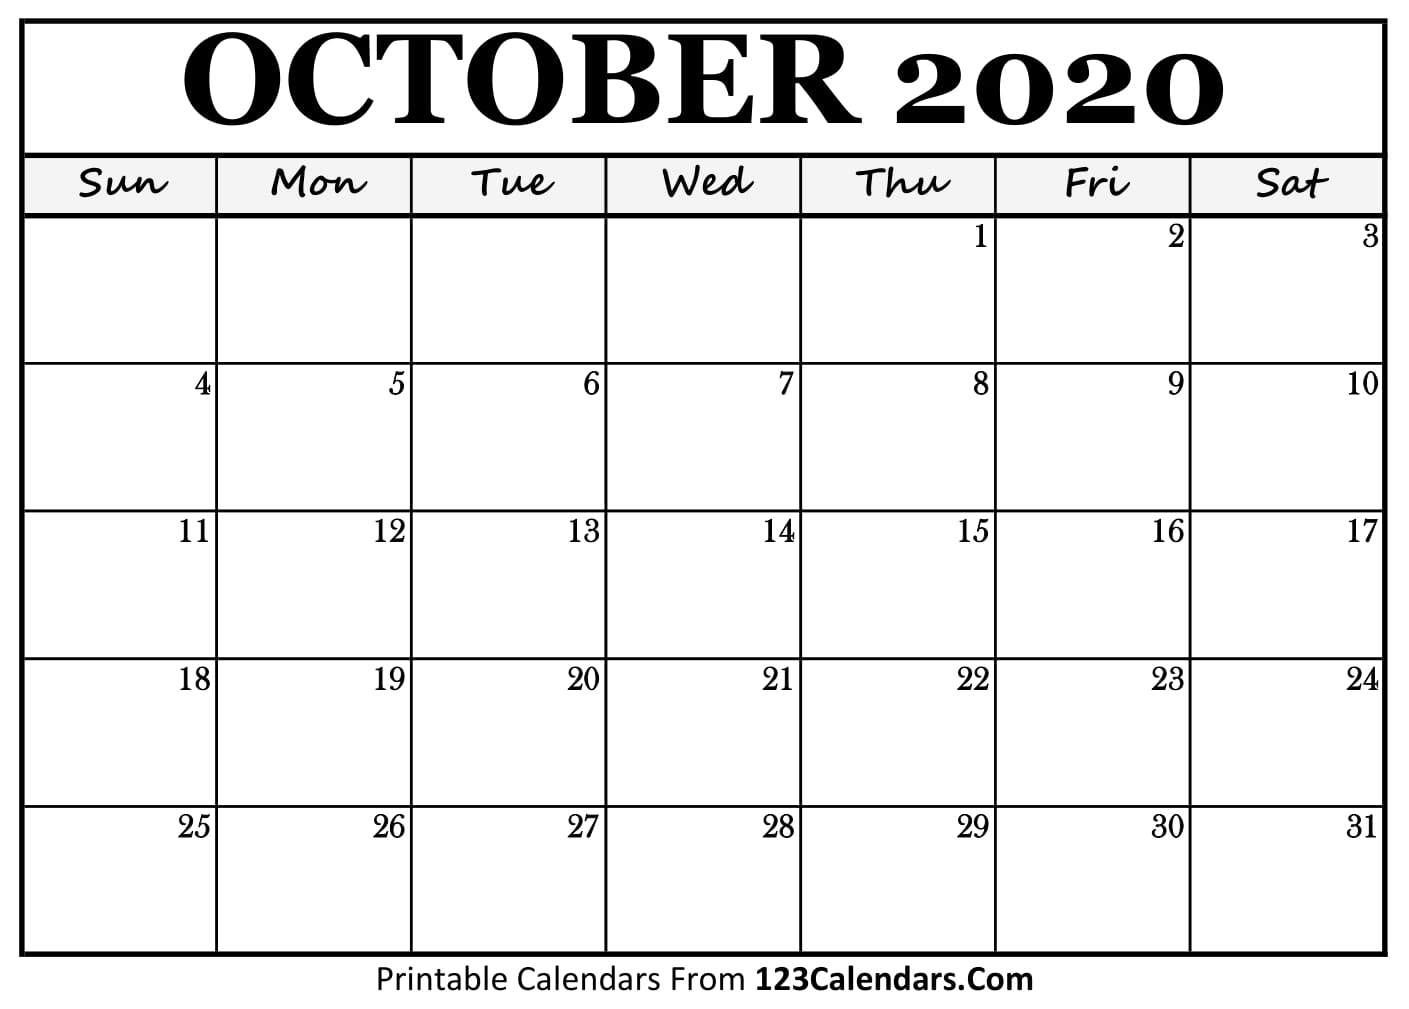 Printable October 2020 Calendar Templates   123Calendars